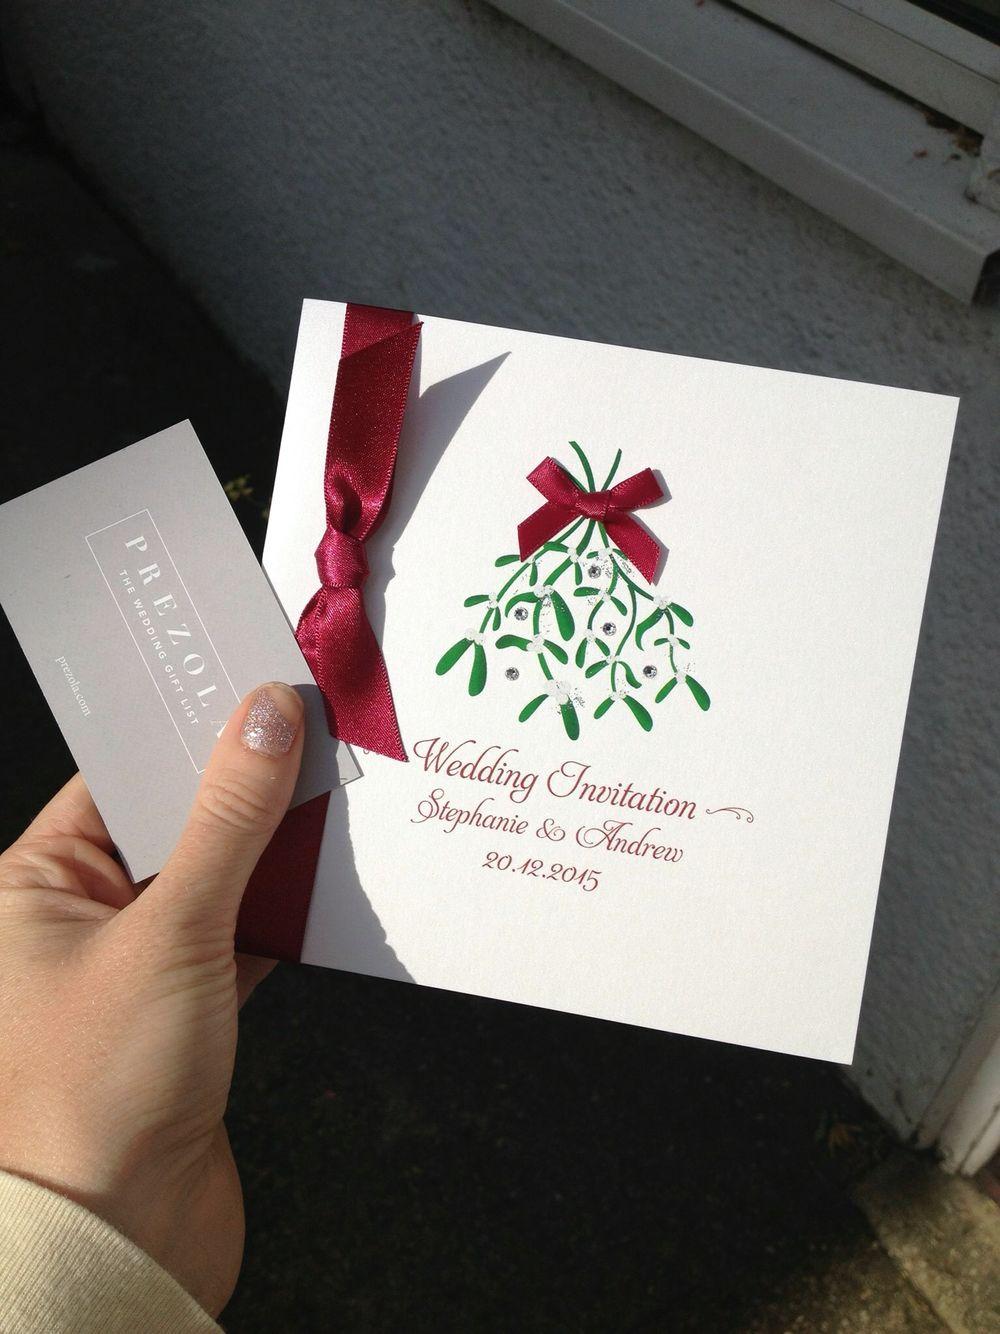 Mistletoe wedding invites thanks to The Wedding Invitation Boutique ...